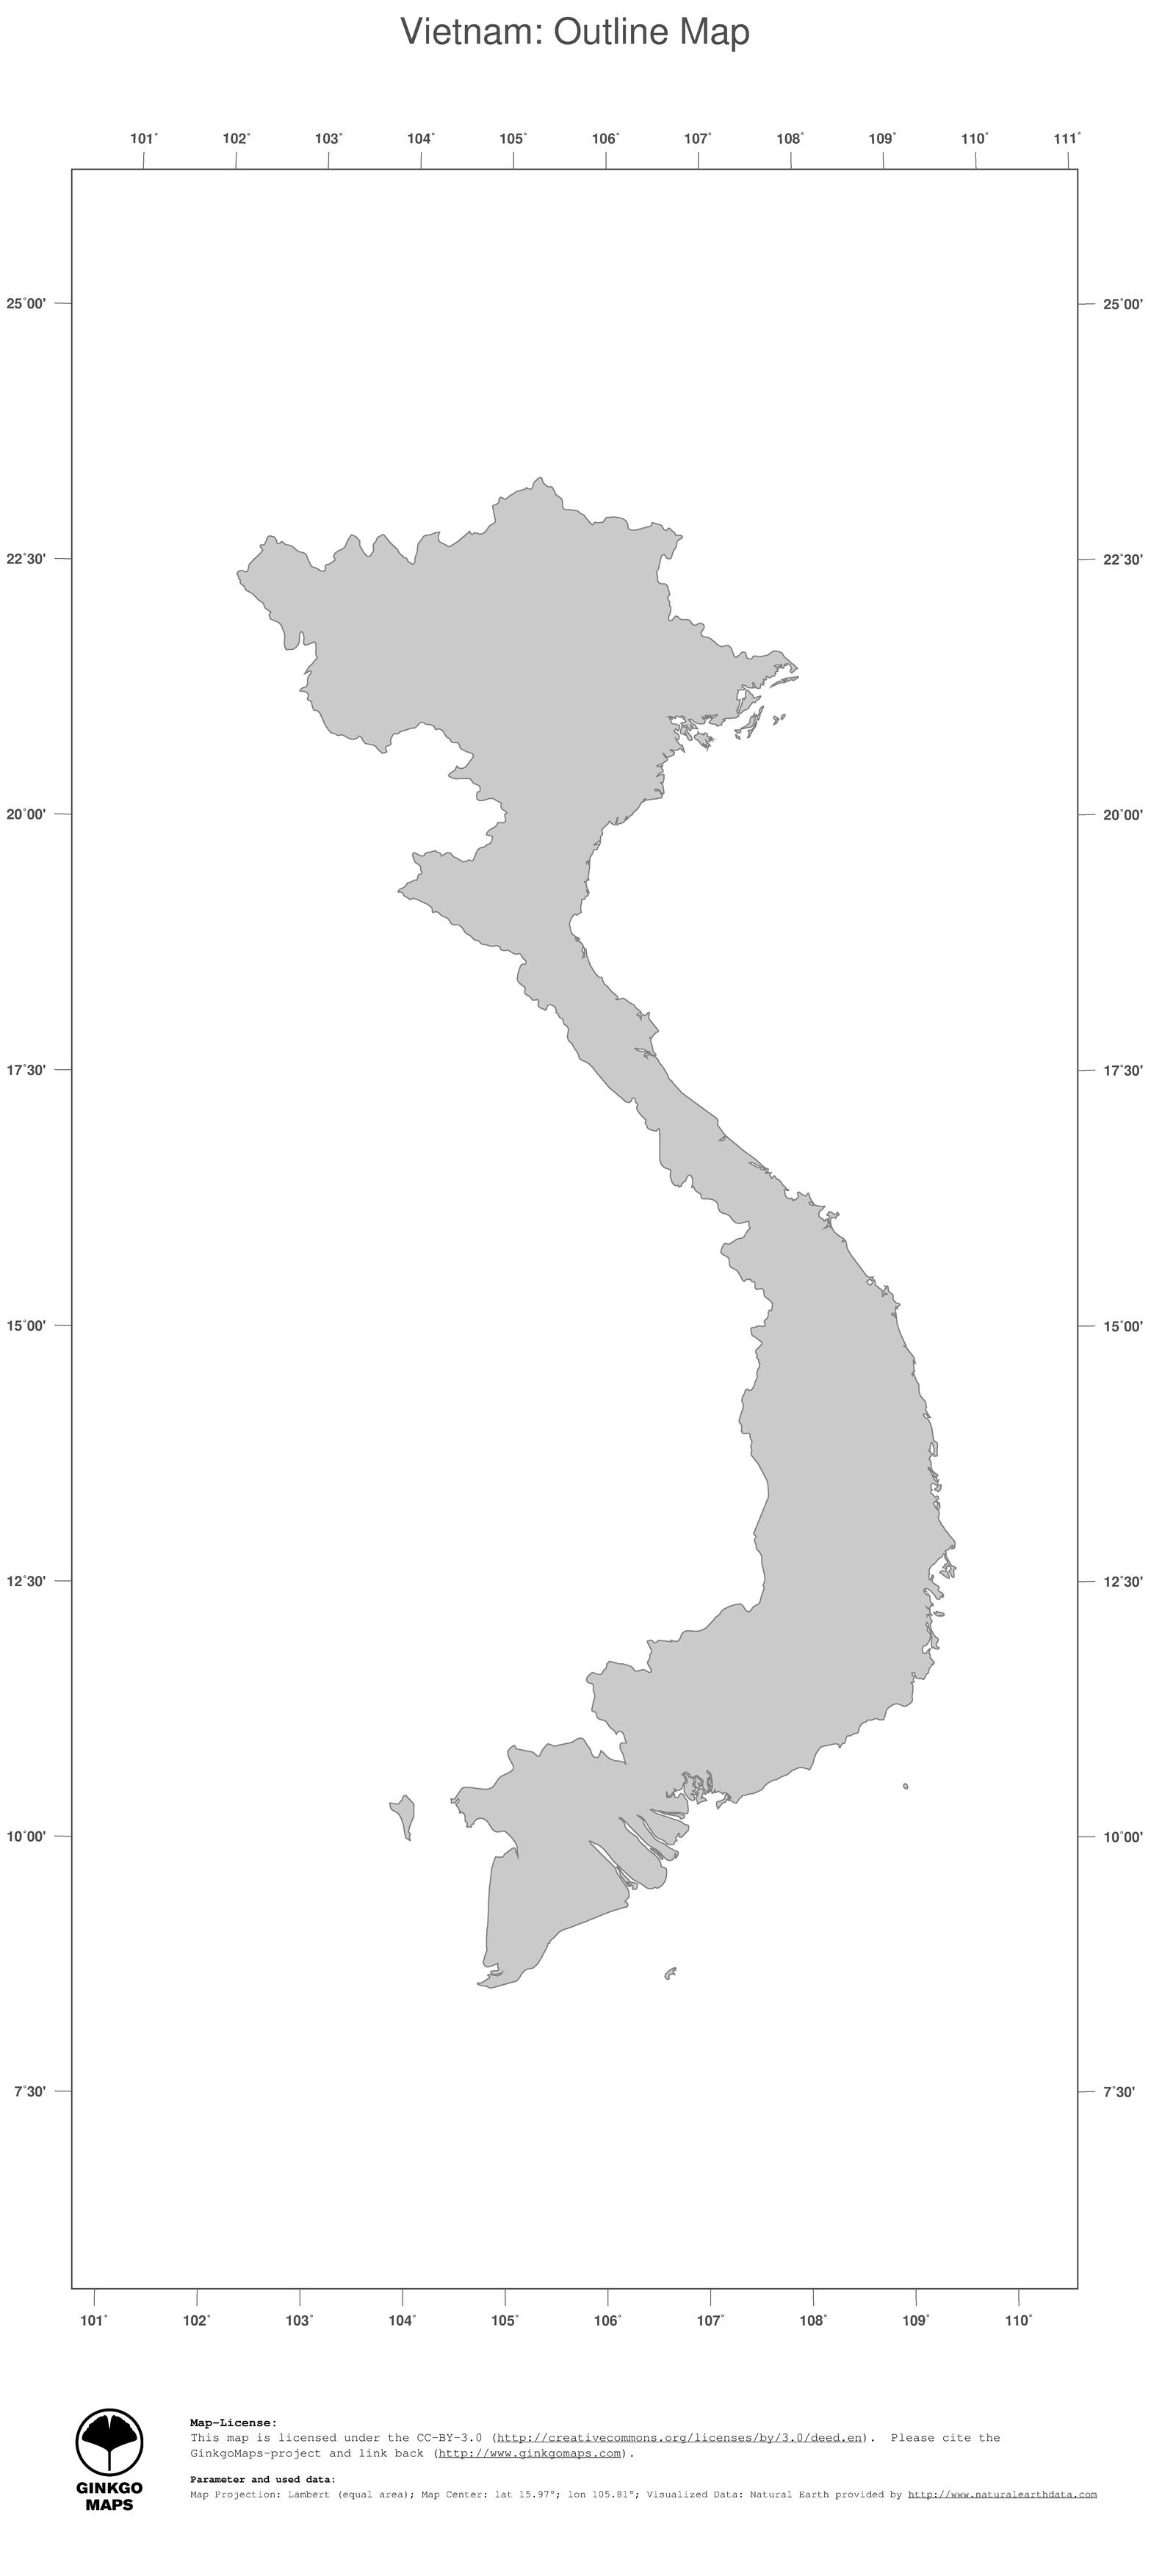 Map Vietnam GinkgoMaps continent Asia region Vietnam